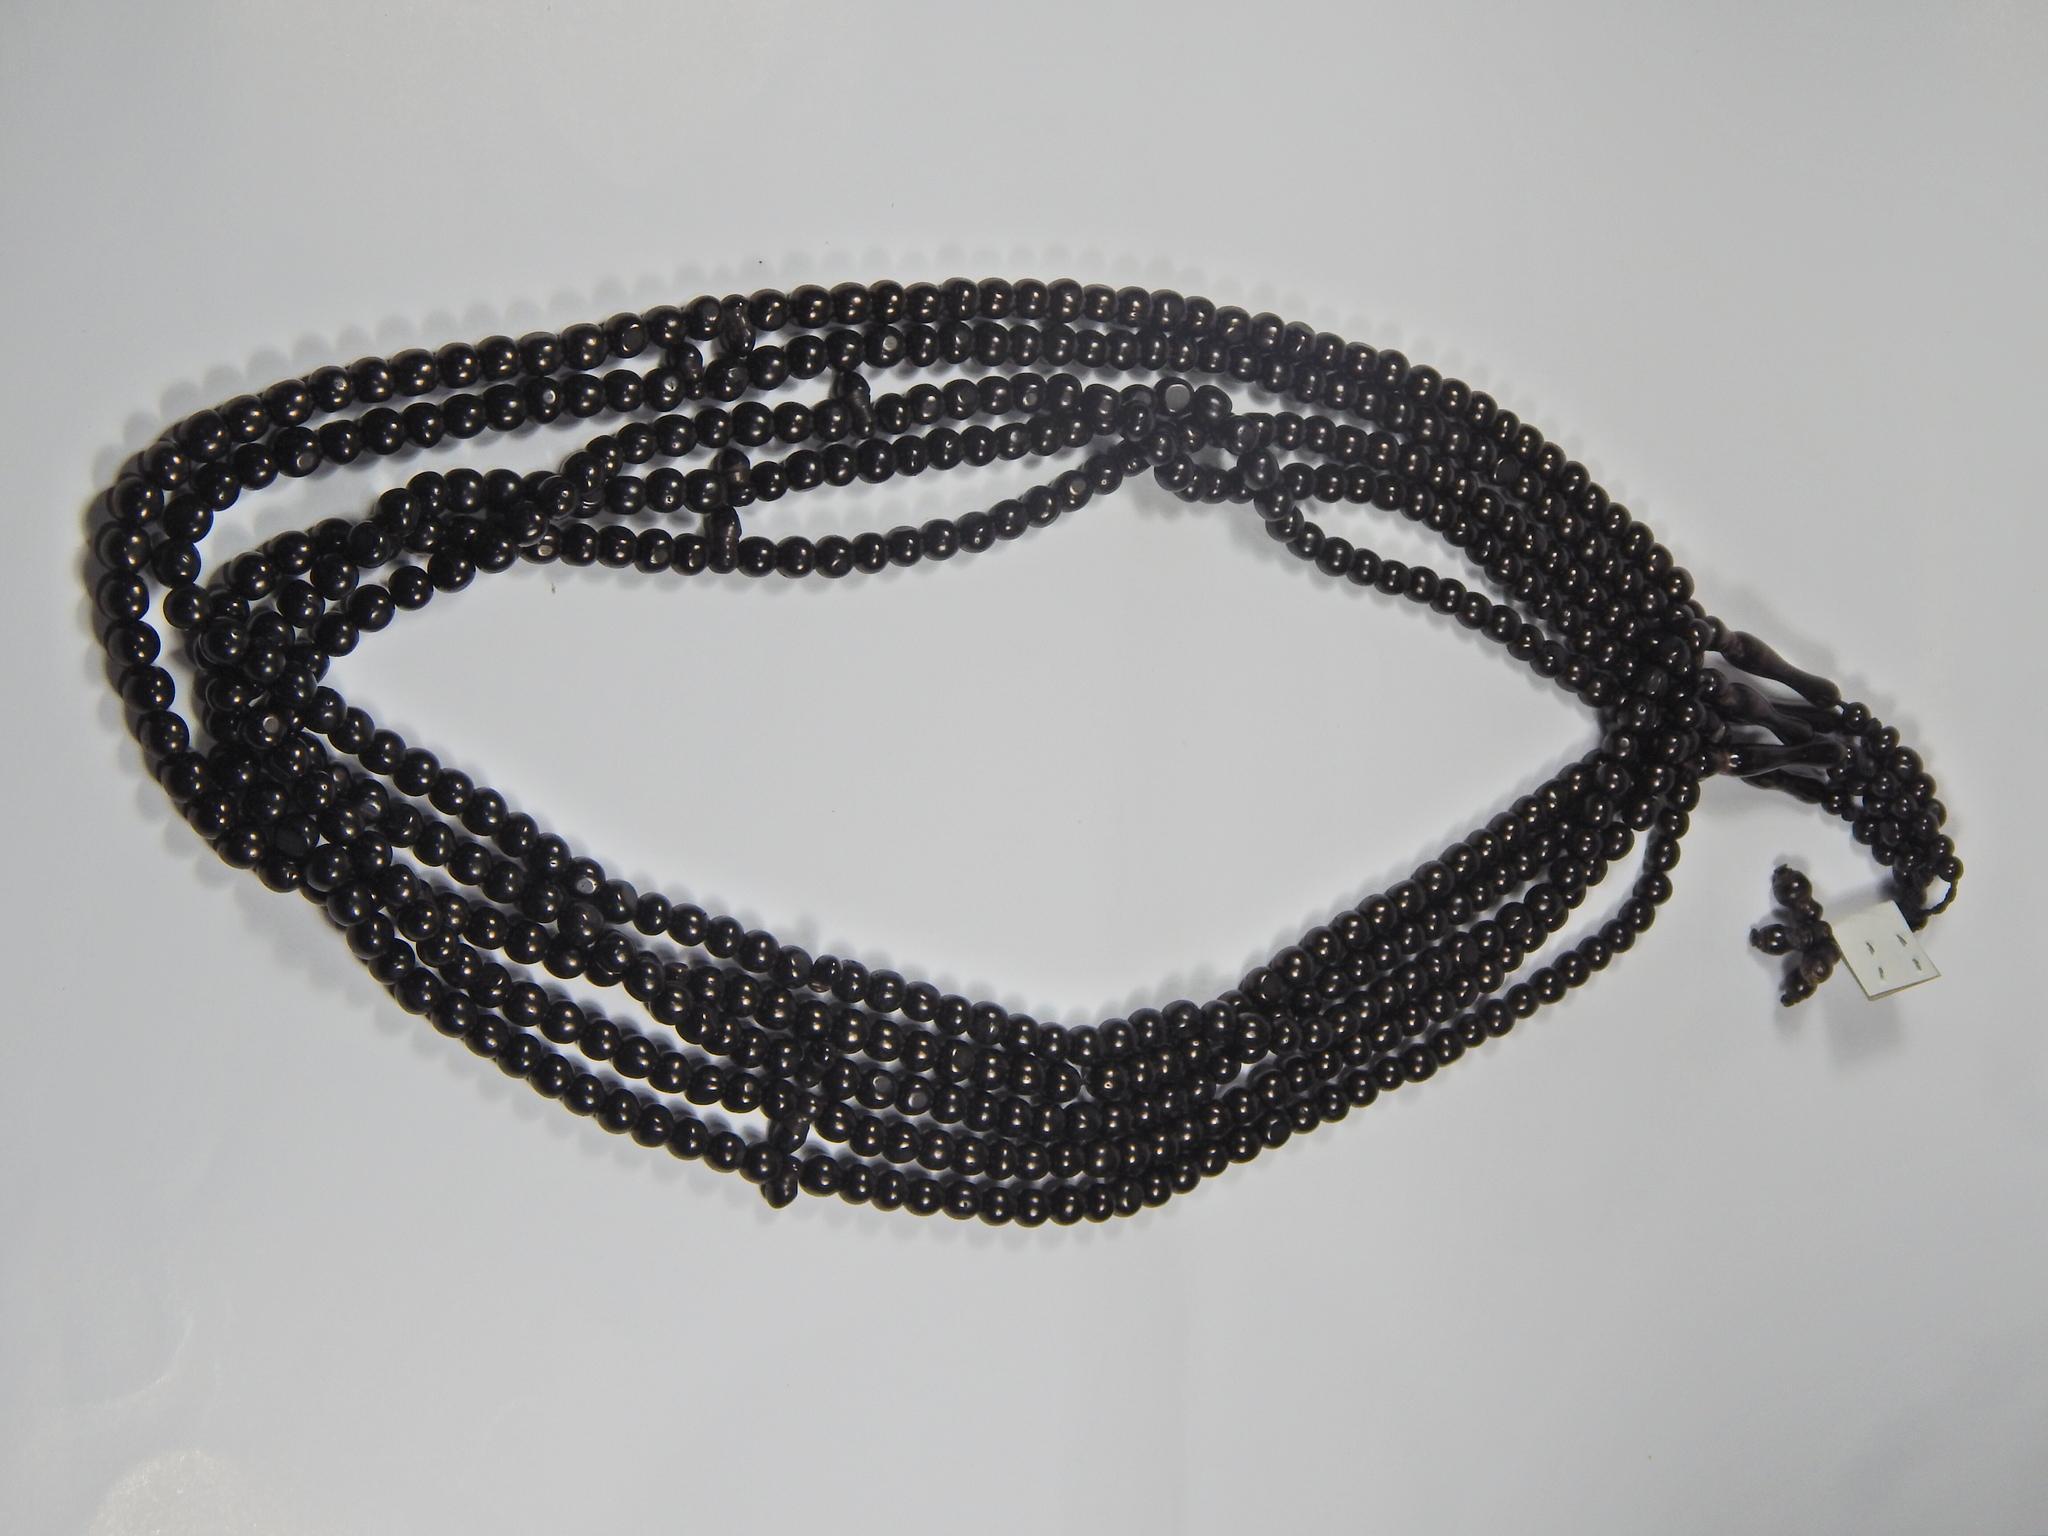 Fitur Diskon Promo Perhiasan Aksesoris Ts8316 Tasbih Kayu Kokka Gelang Kaukah Merica Kecil Hitam Koka Asli Detail Gambar Kokkah Kokah Murah Terbaru